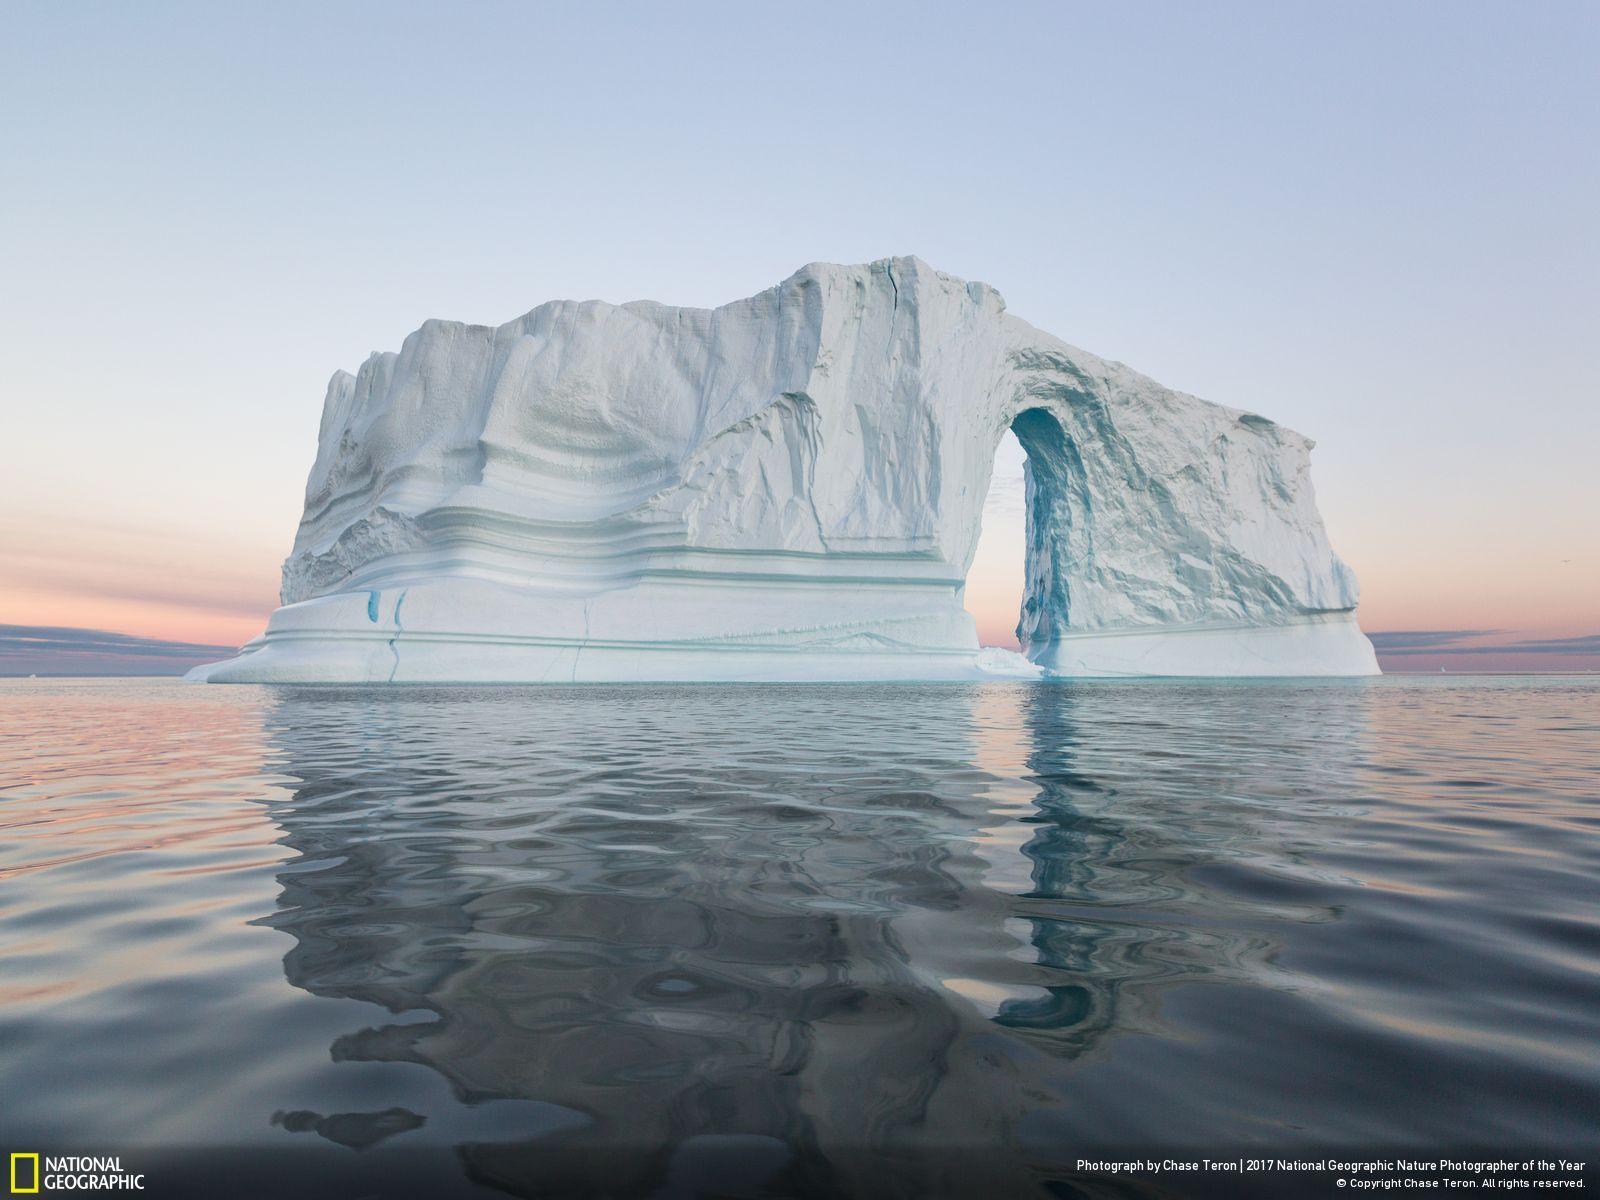 Actu National Geographic